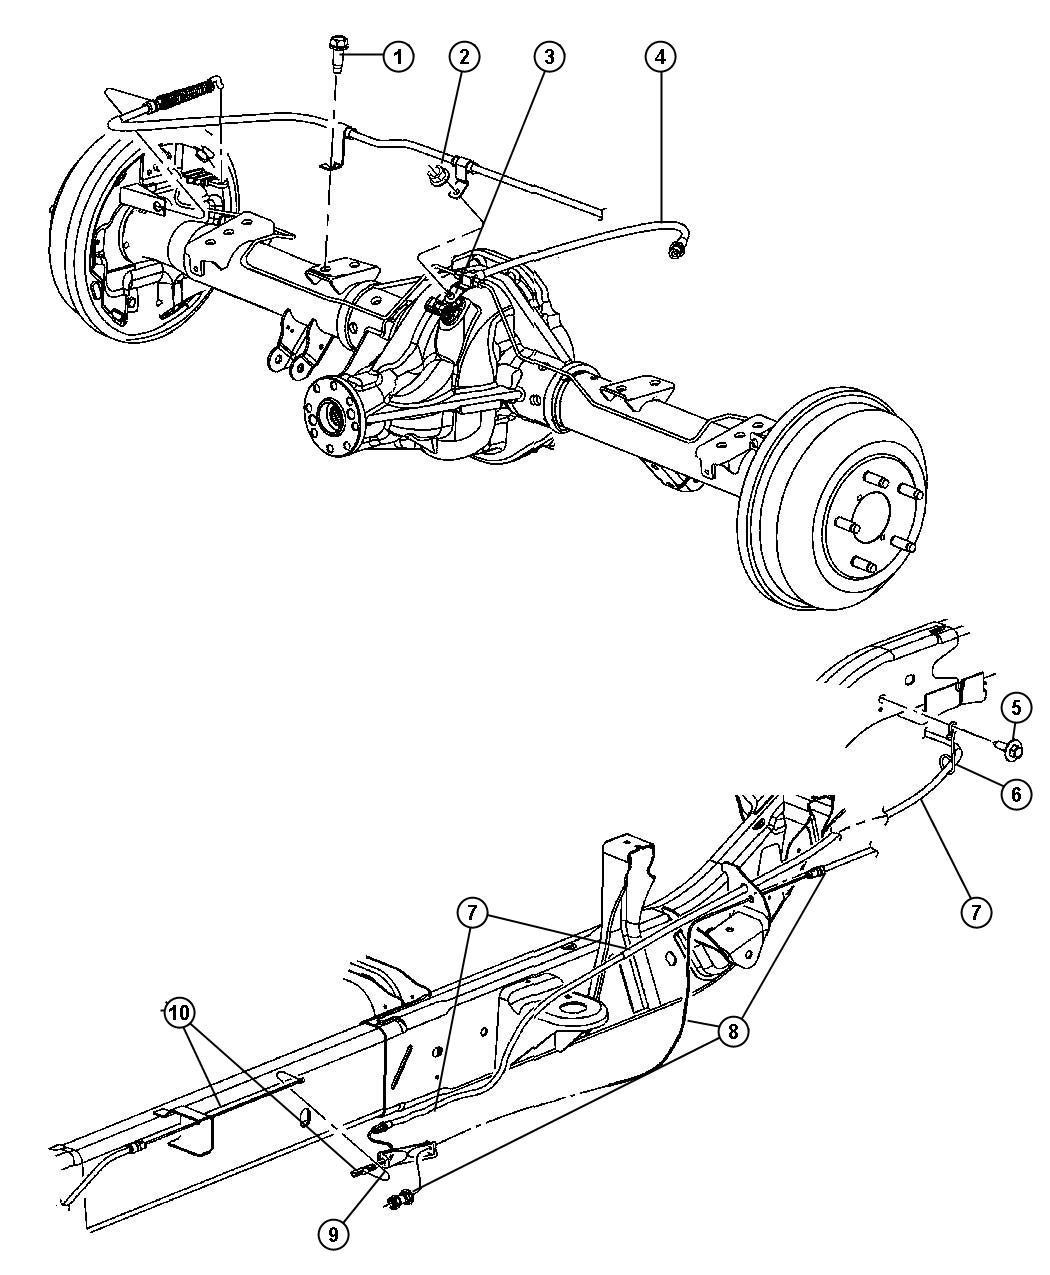 2008 Dodge Dakota Cable. Front. Parking brake. With